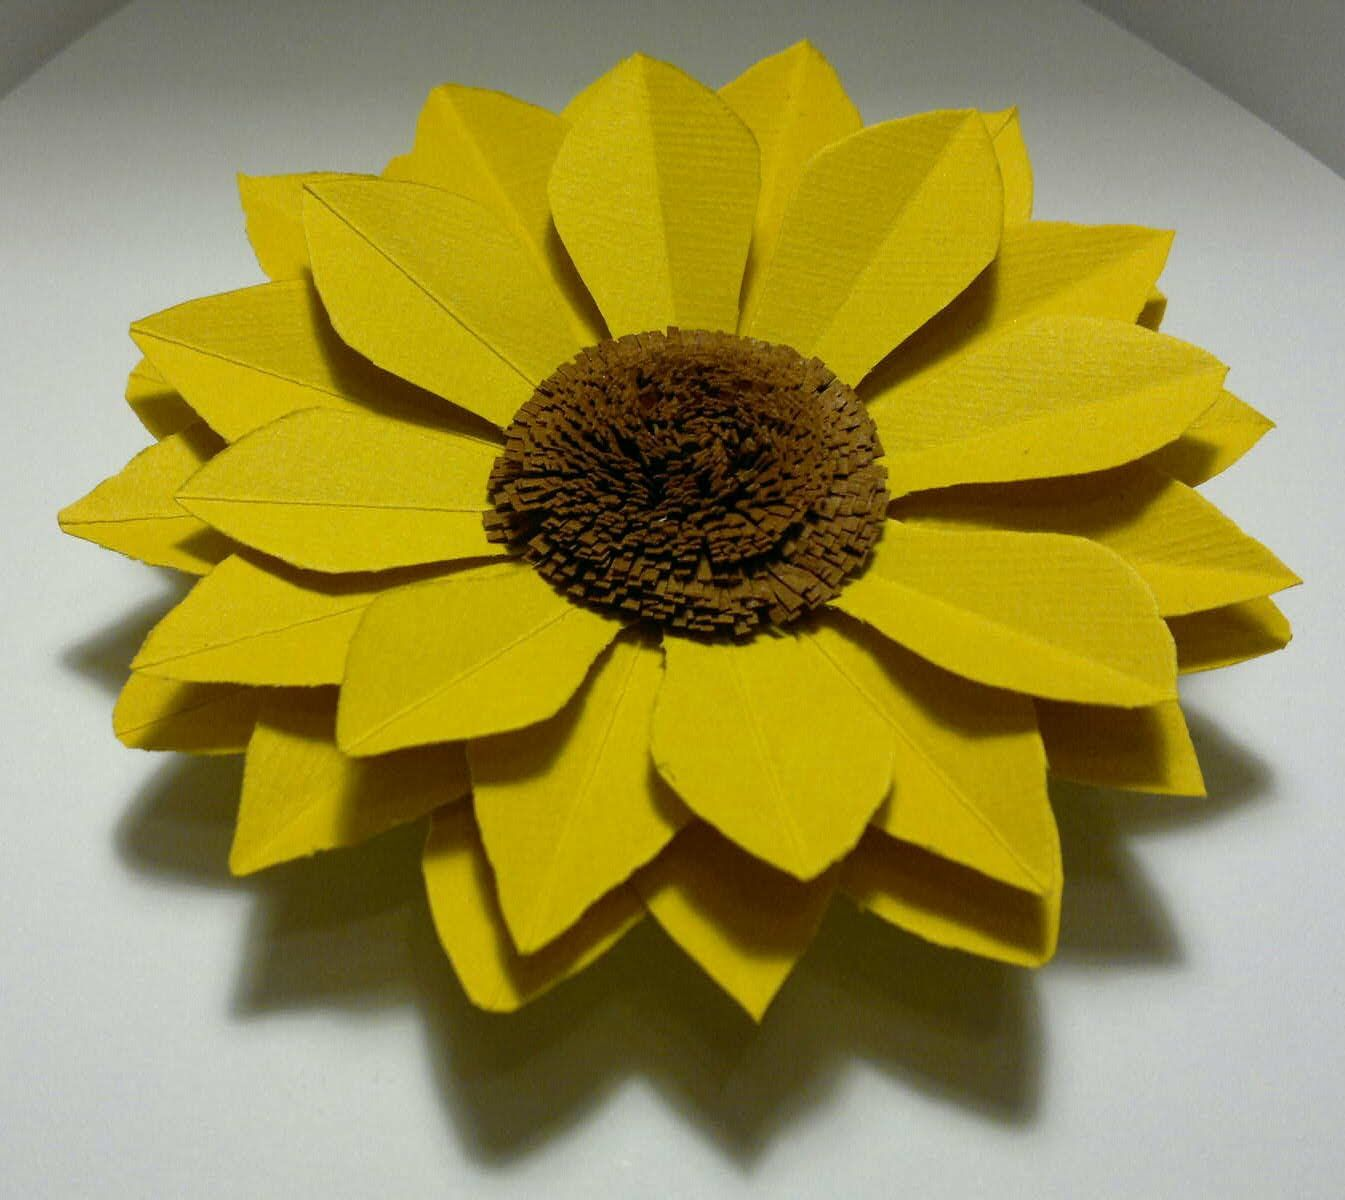 DIY Sunflower tutorial paper/cardboard | Sunflower | Pinterest ...